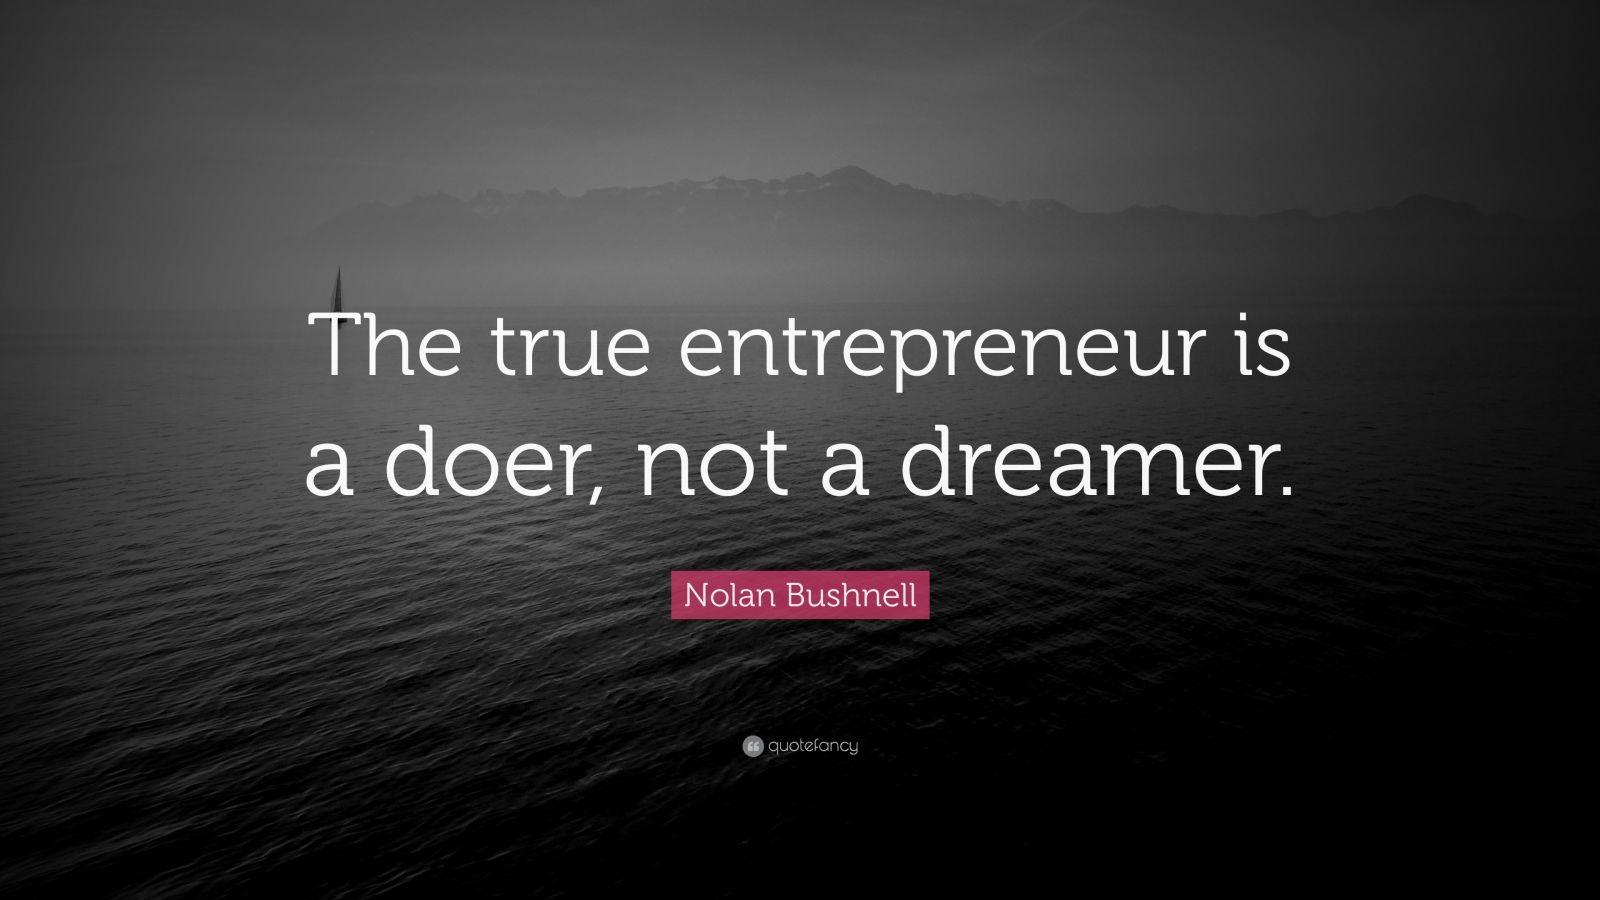 Nolan bushnell quote the true entrepreneur is a doer not a dreamer 23 wallpapers quotefancy - Entrepreneur wallpaper ...